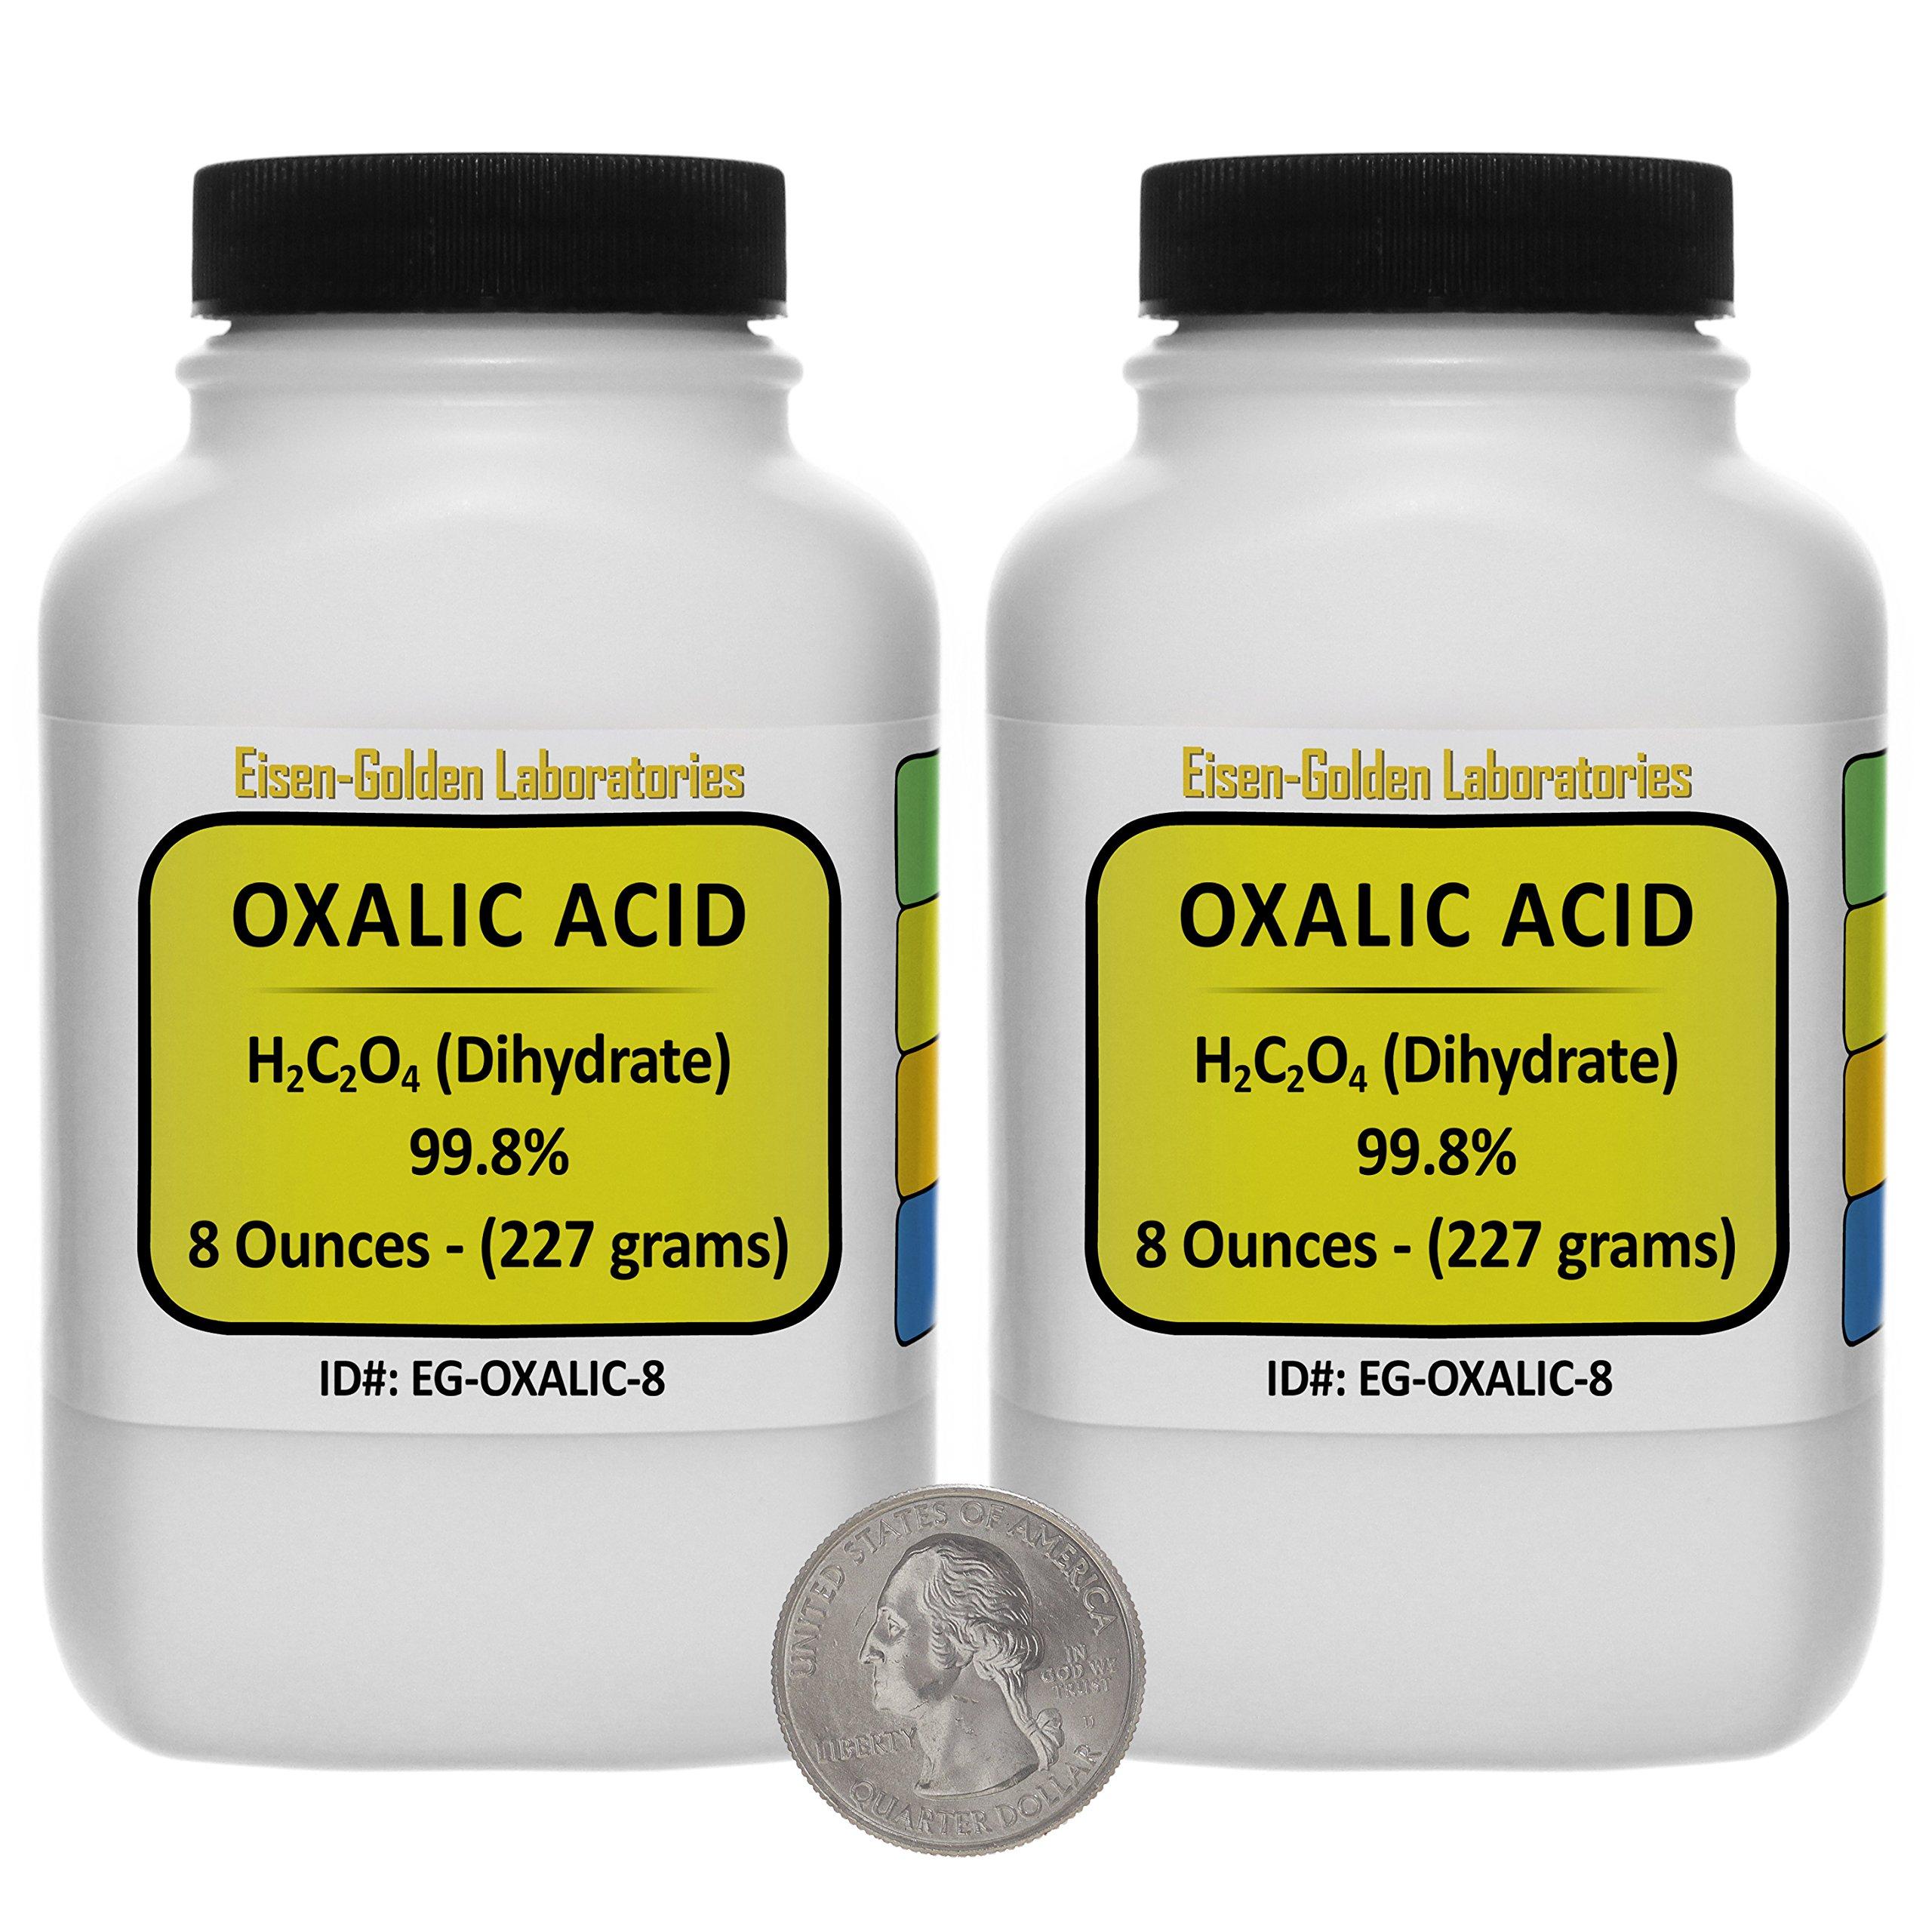 Oxalic Acid [C2H2O4] 99.8% ACS Grade Powder 1 Lb in Two Space-Saver Bottles USA